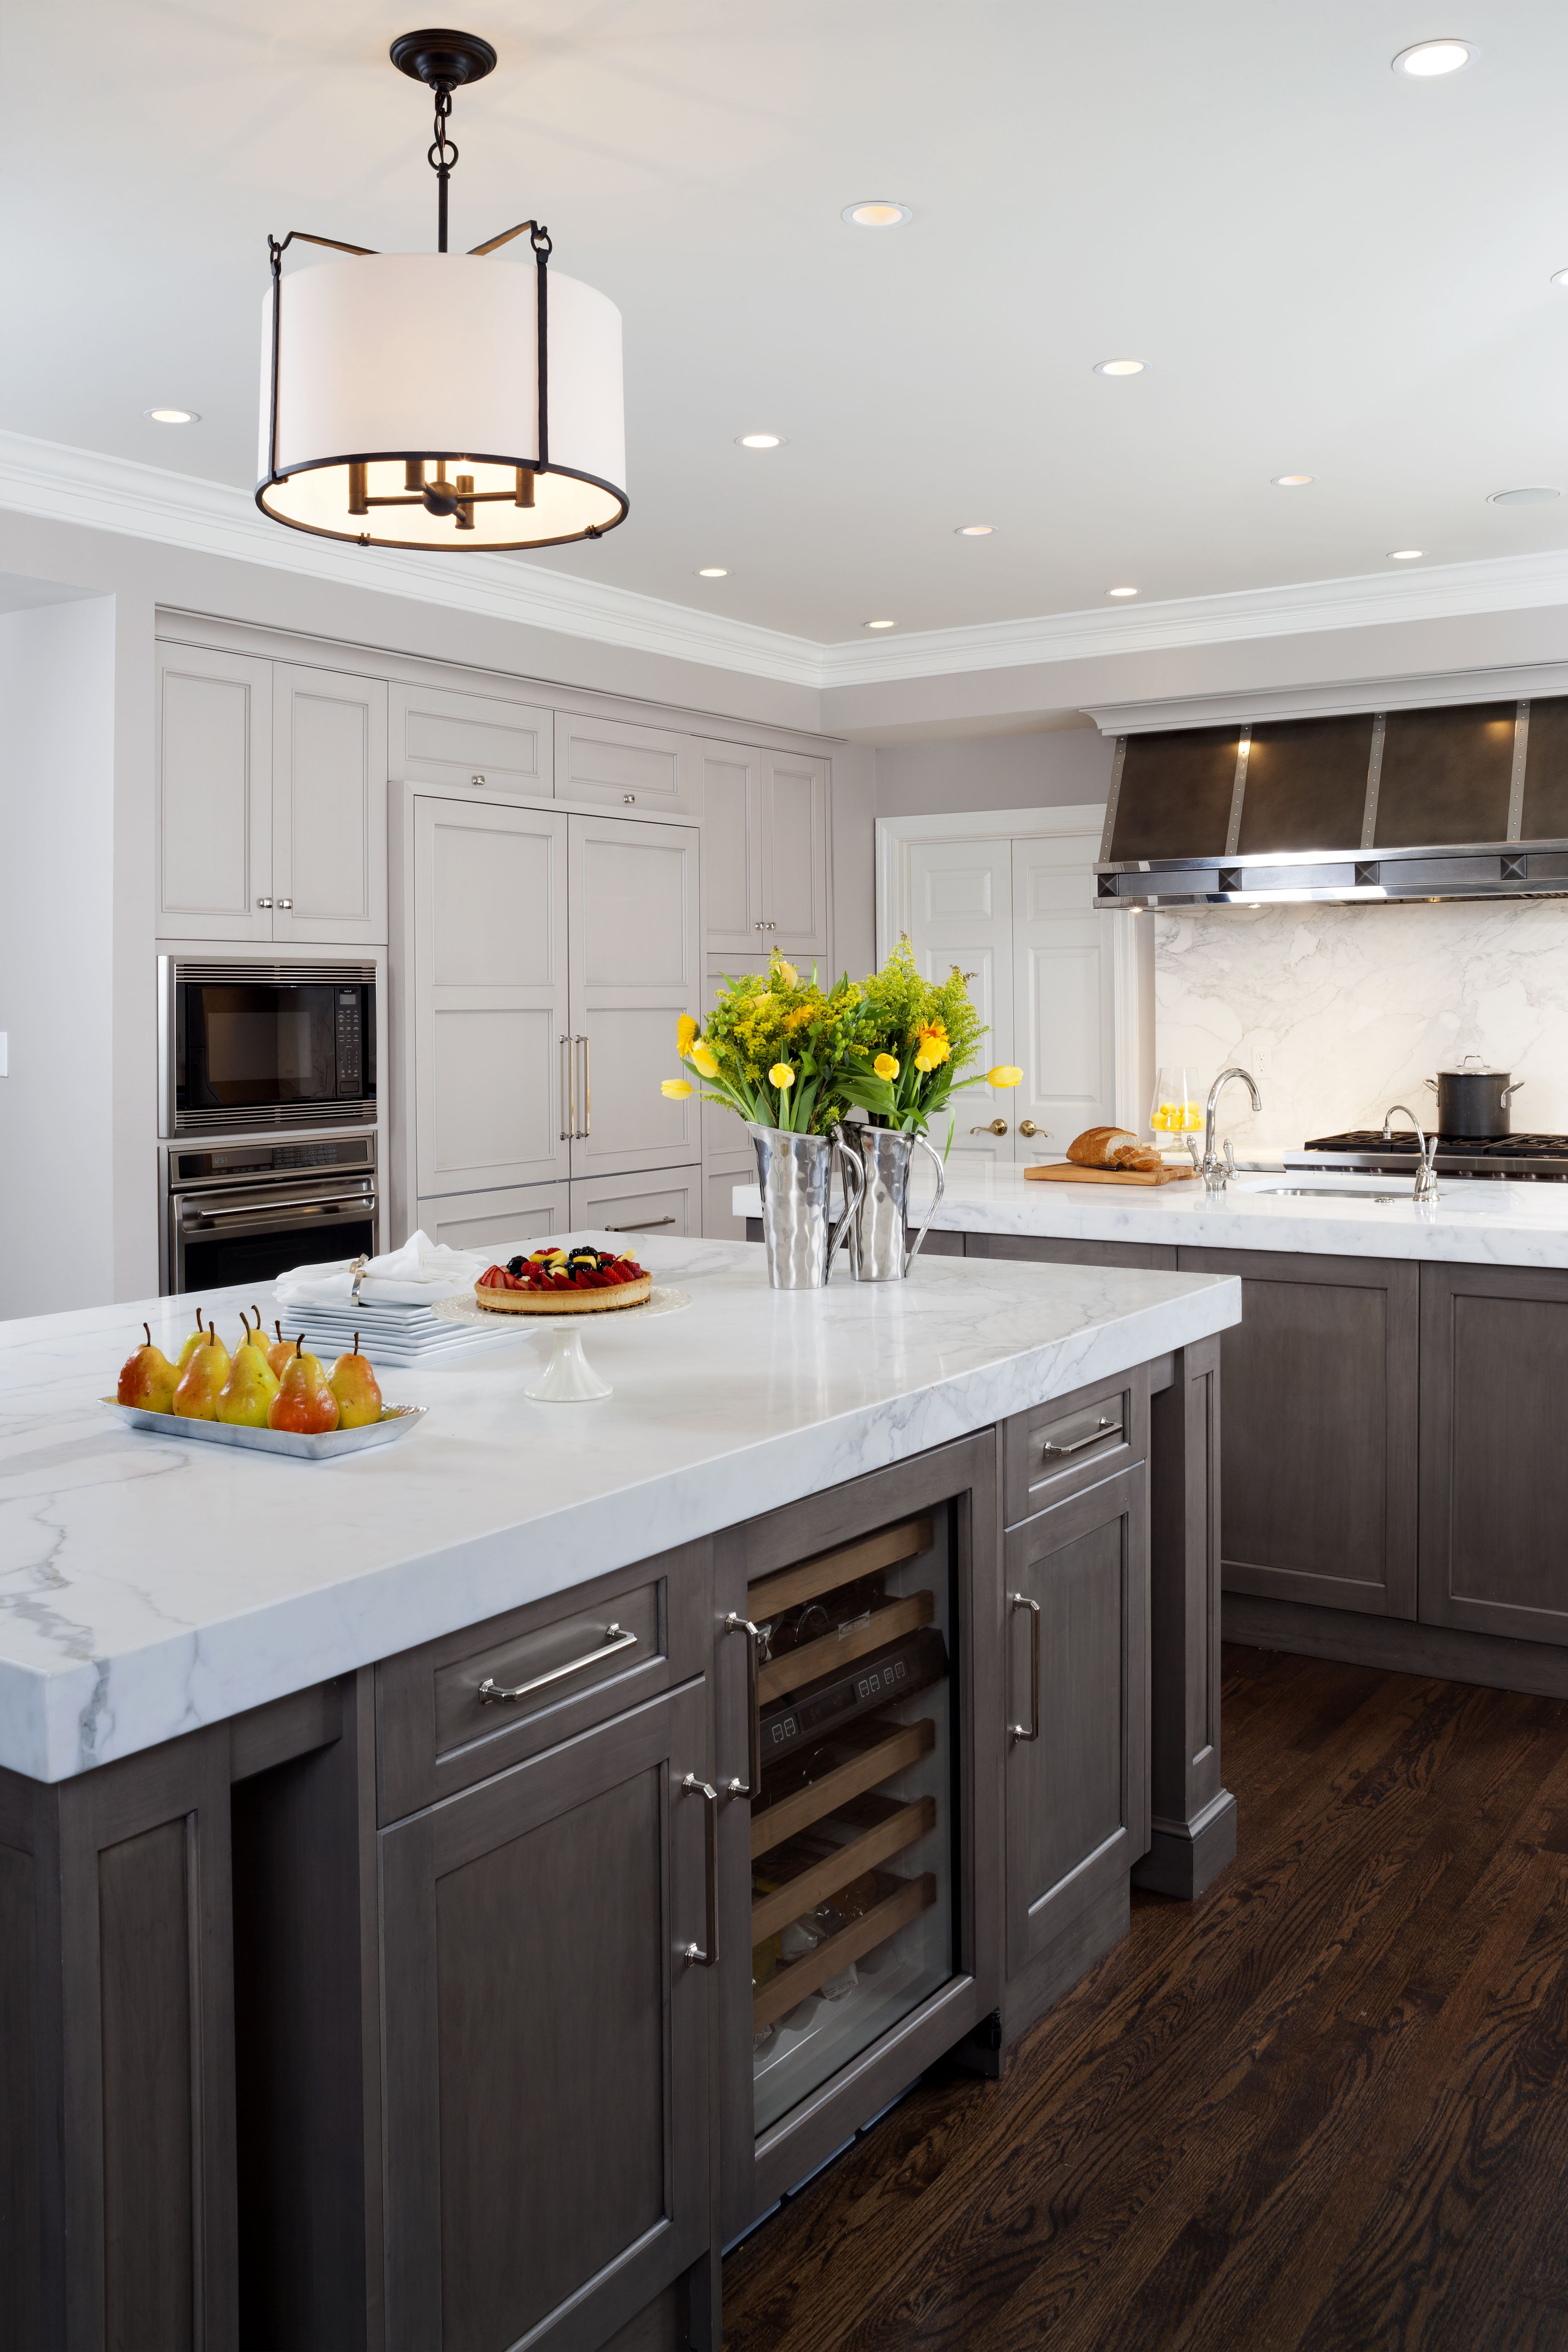 Designed by Kristin Peake Interiors with Jack Rosen Custom